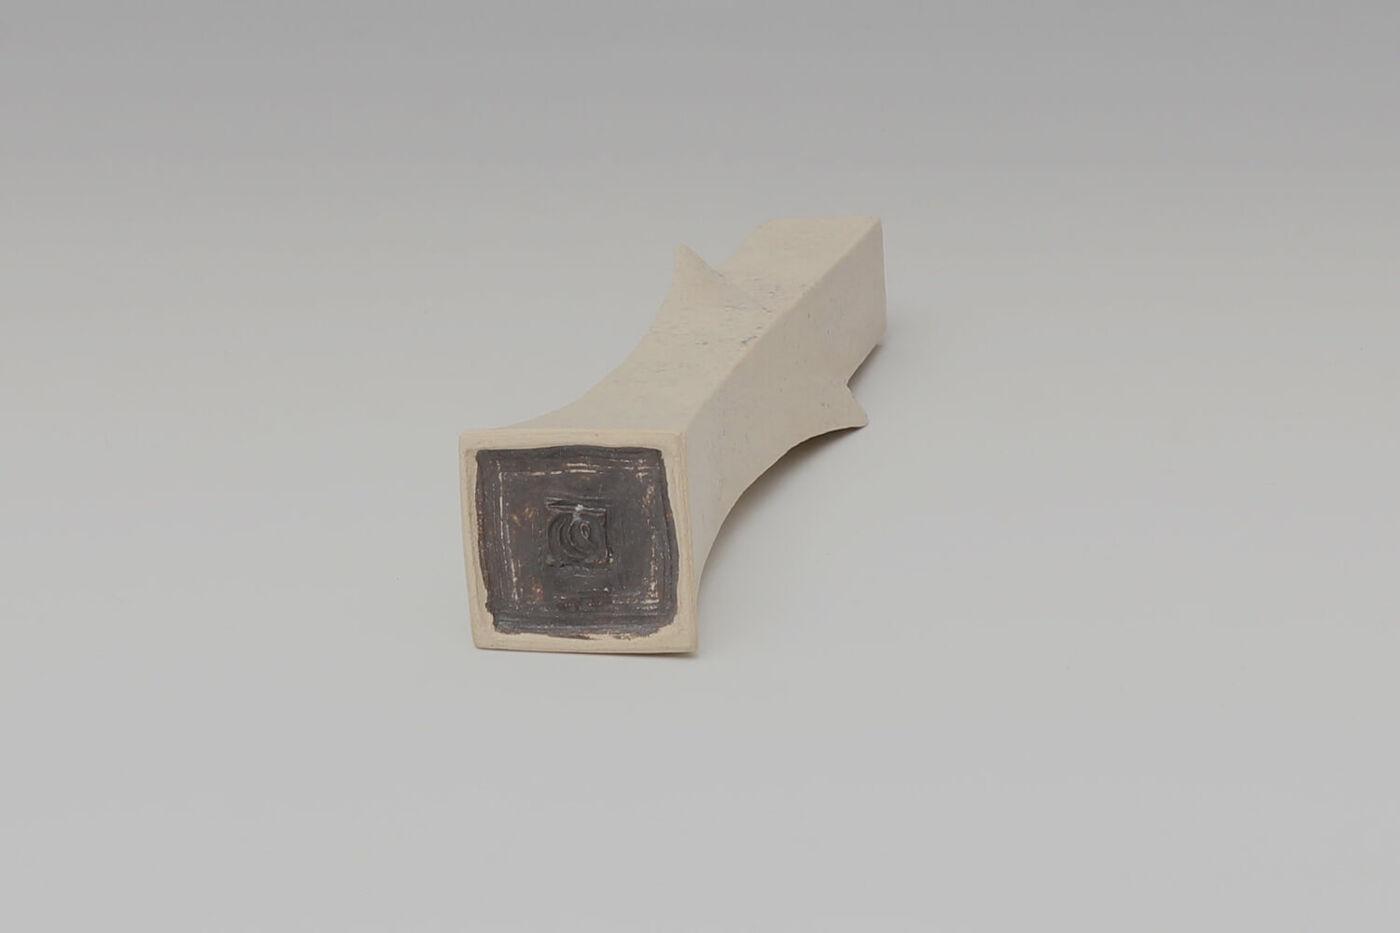 Chris Carter Ceramic Squared Totemic Form 146